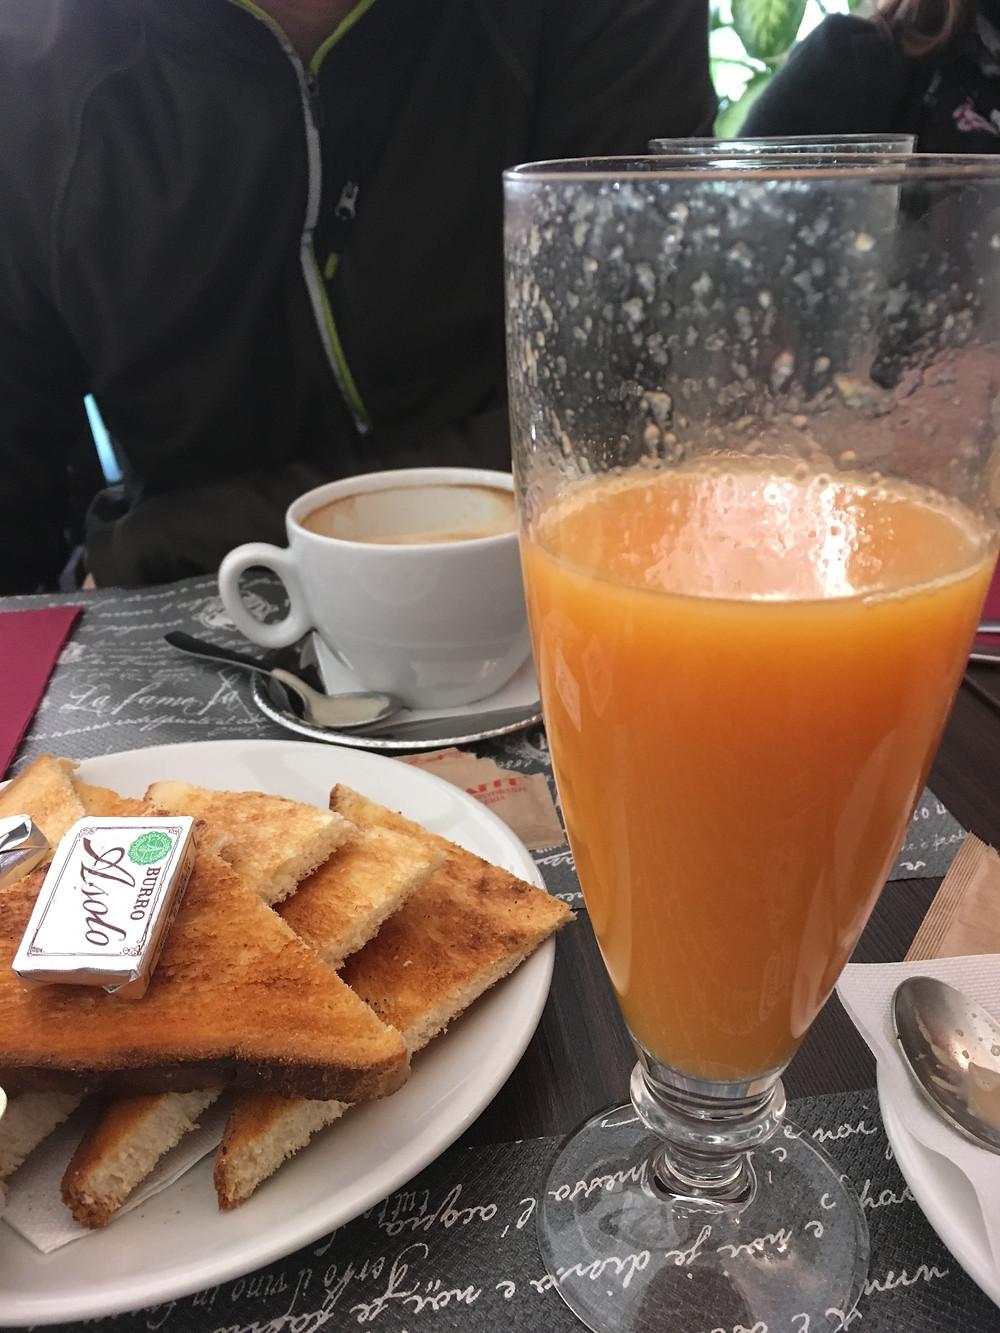 Fresh Squeezed orange juice in Rome!